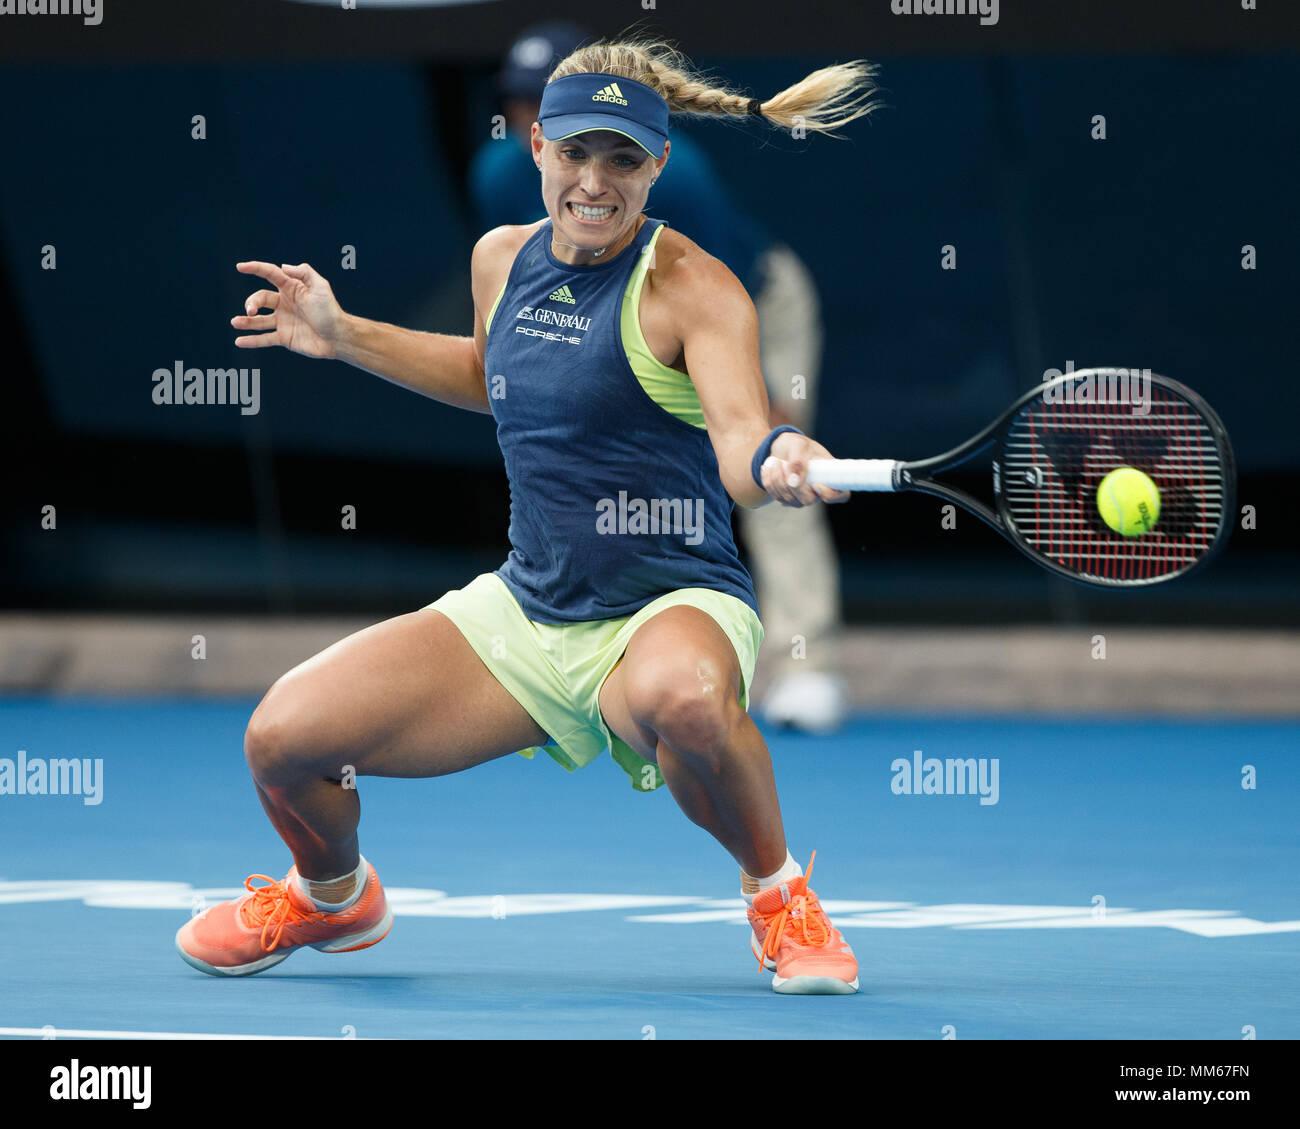 Tennisspielerin Kerber